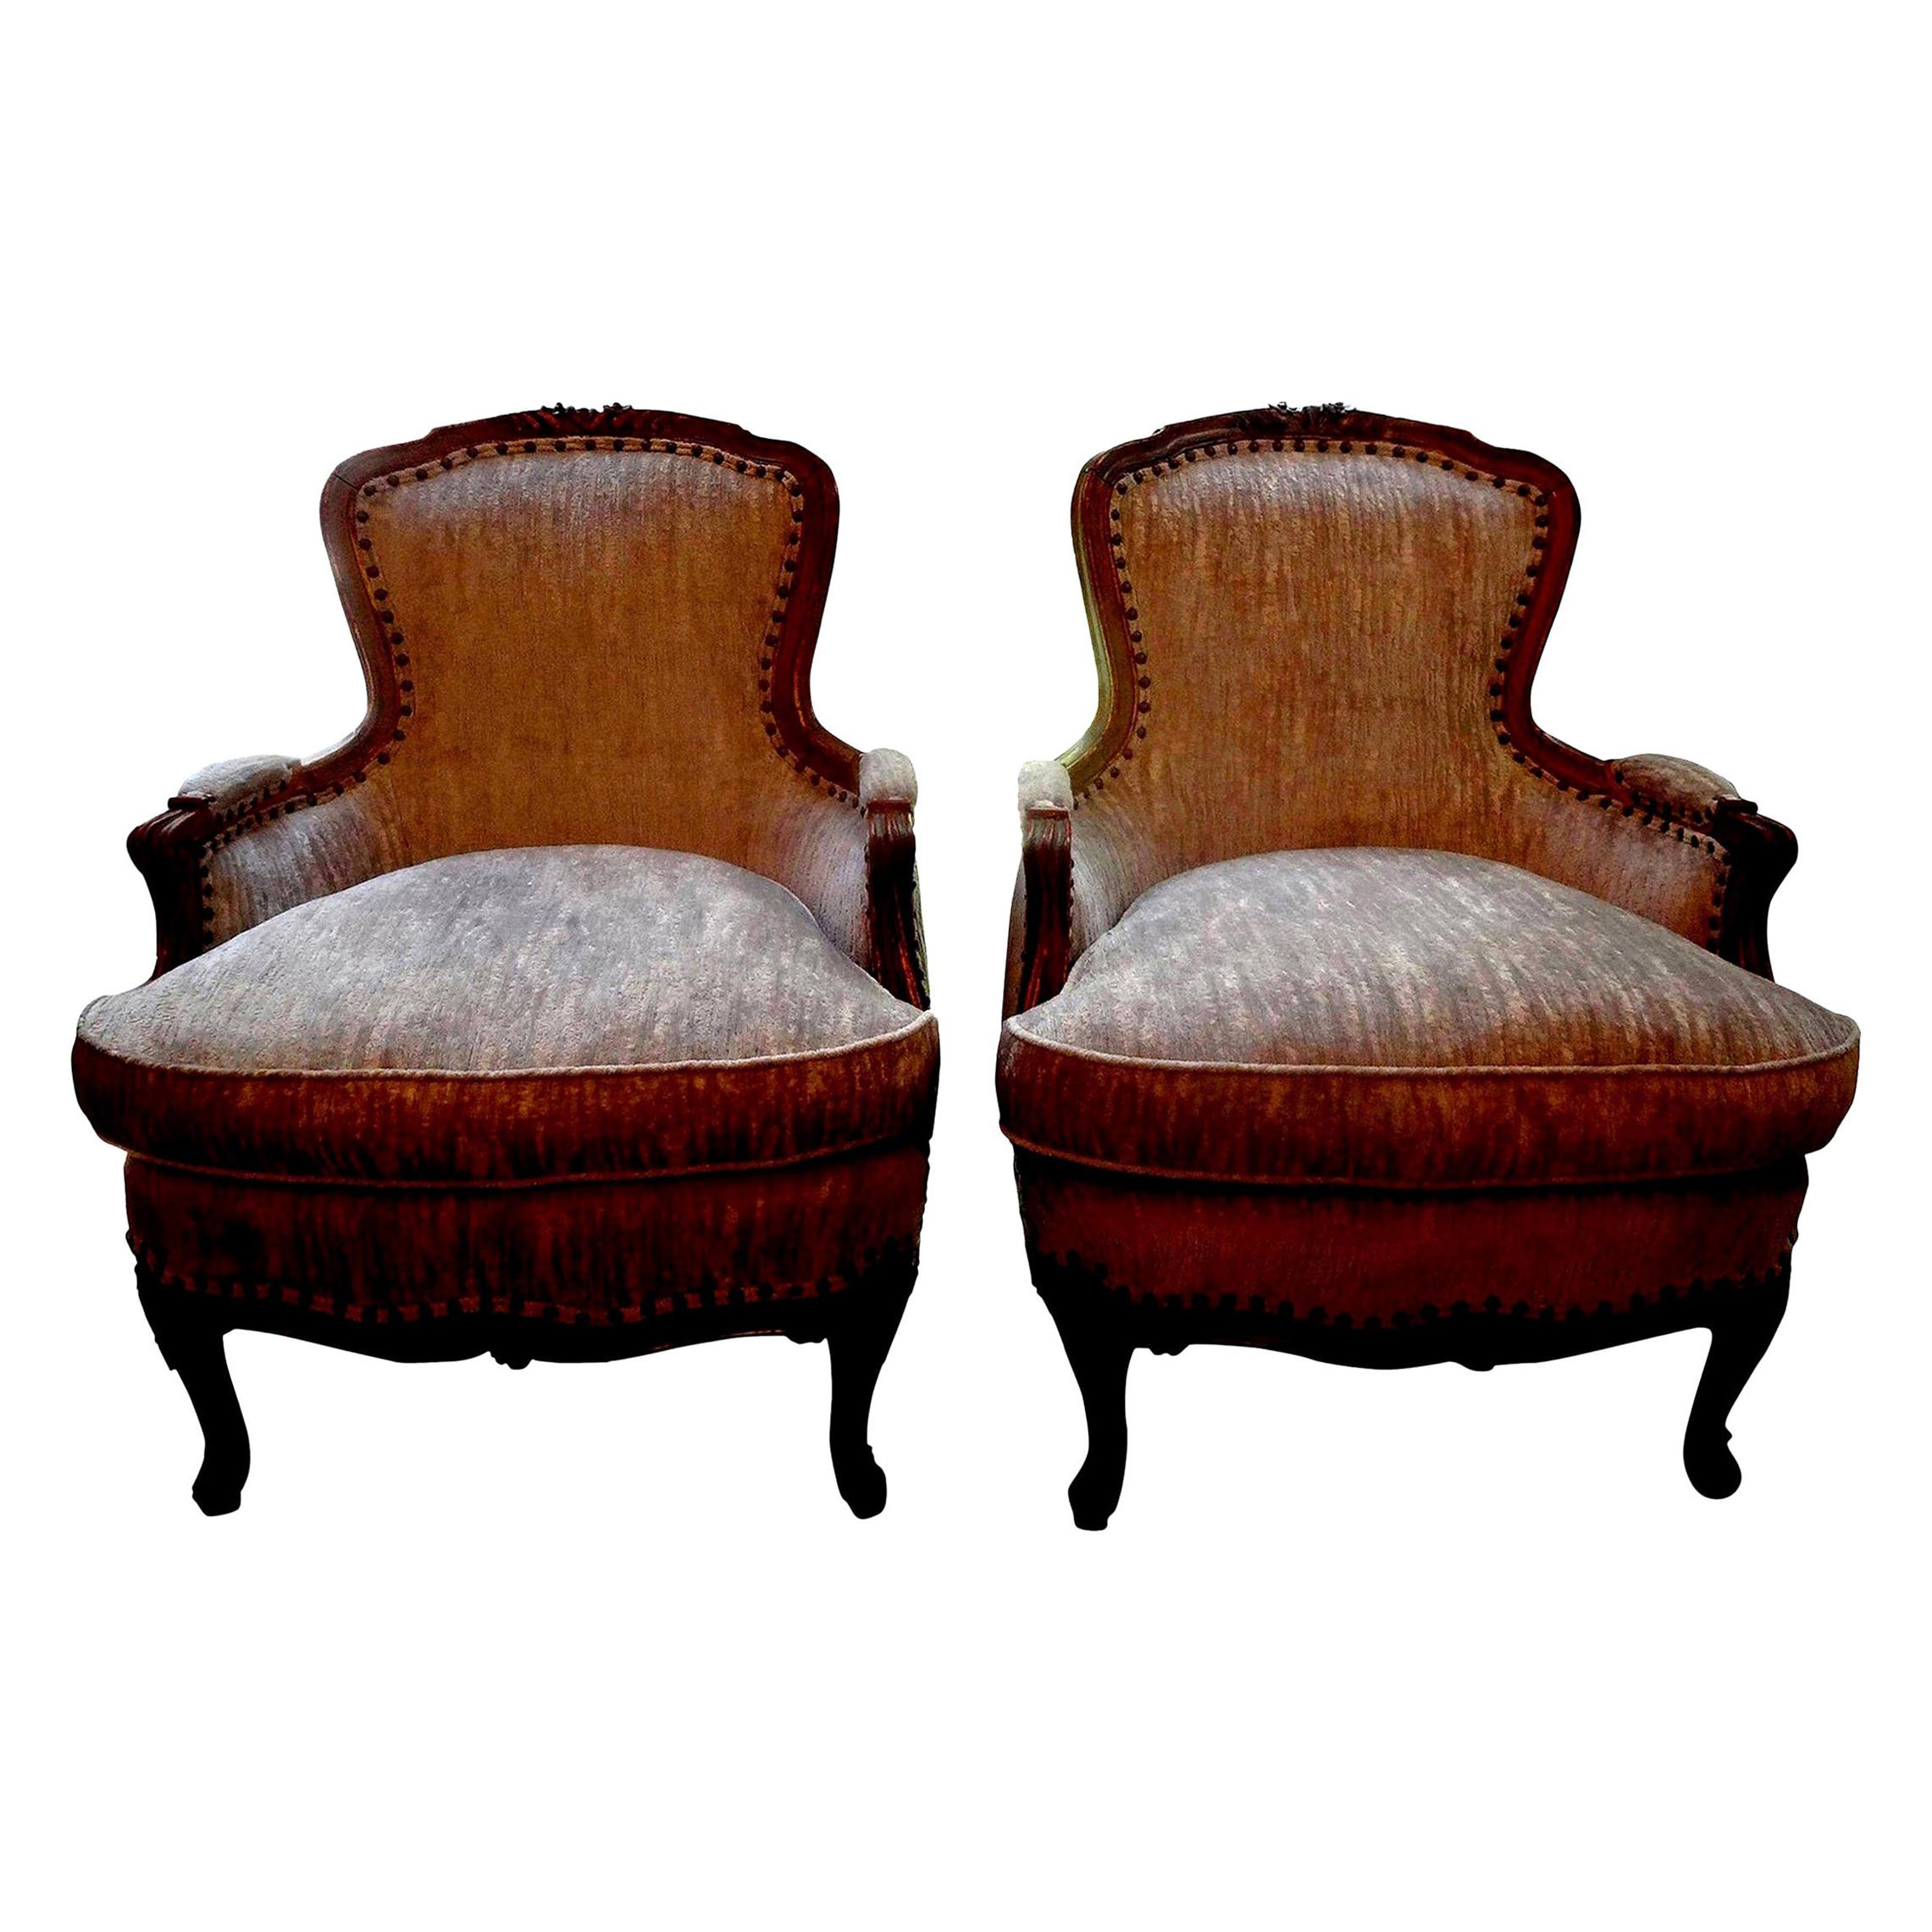 Pair of 19th Century Italian Louis XV Style Bergères